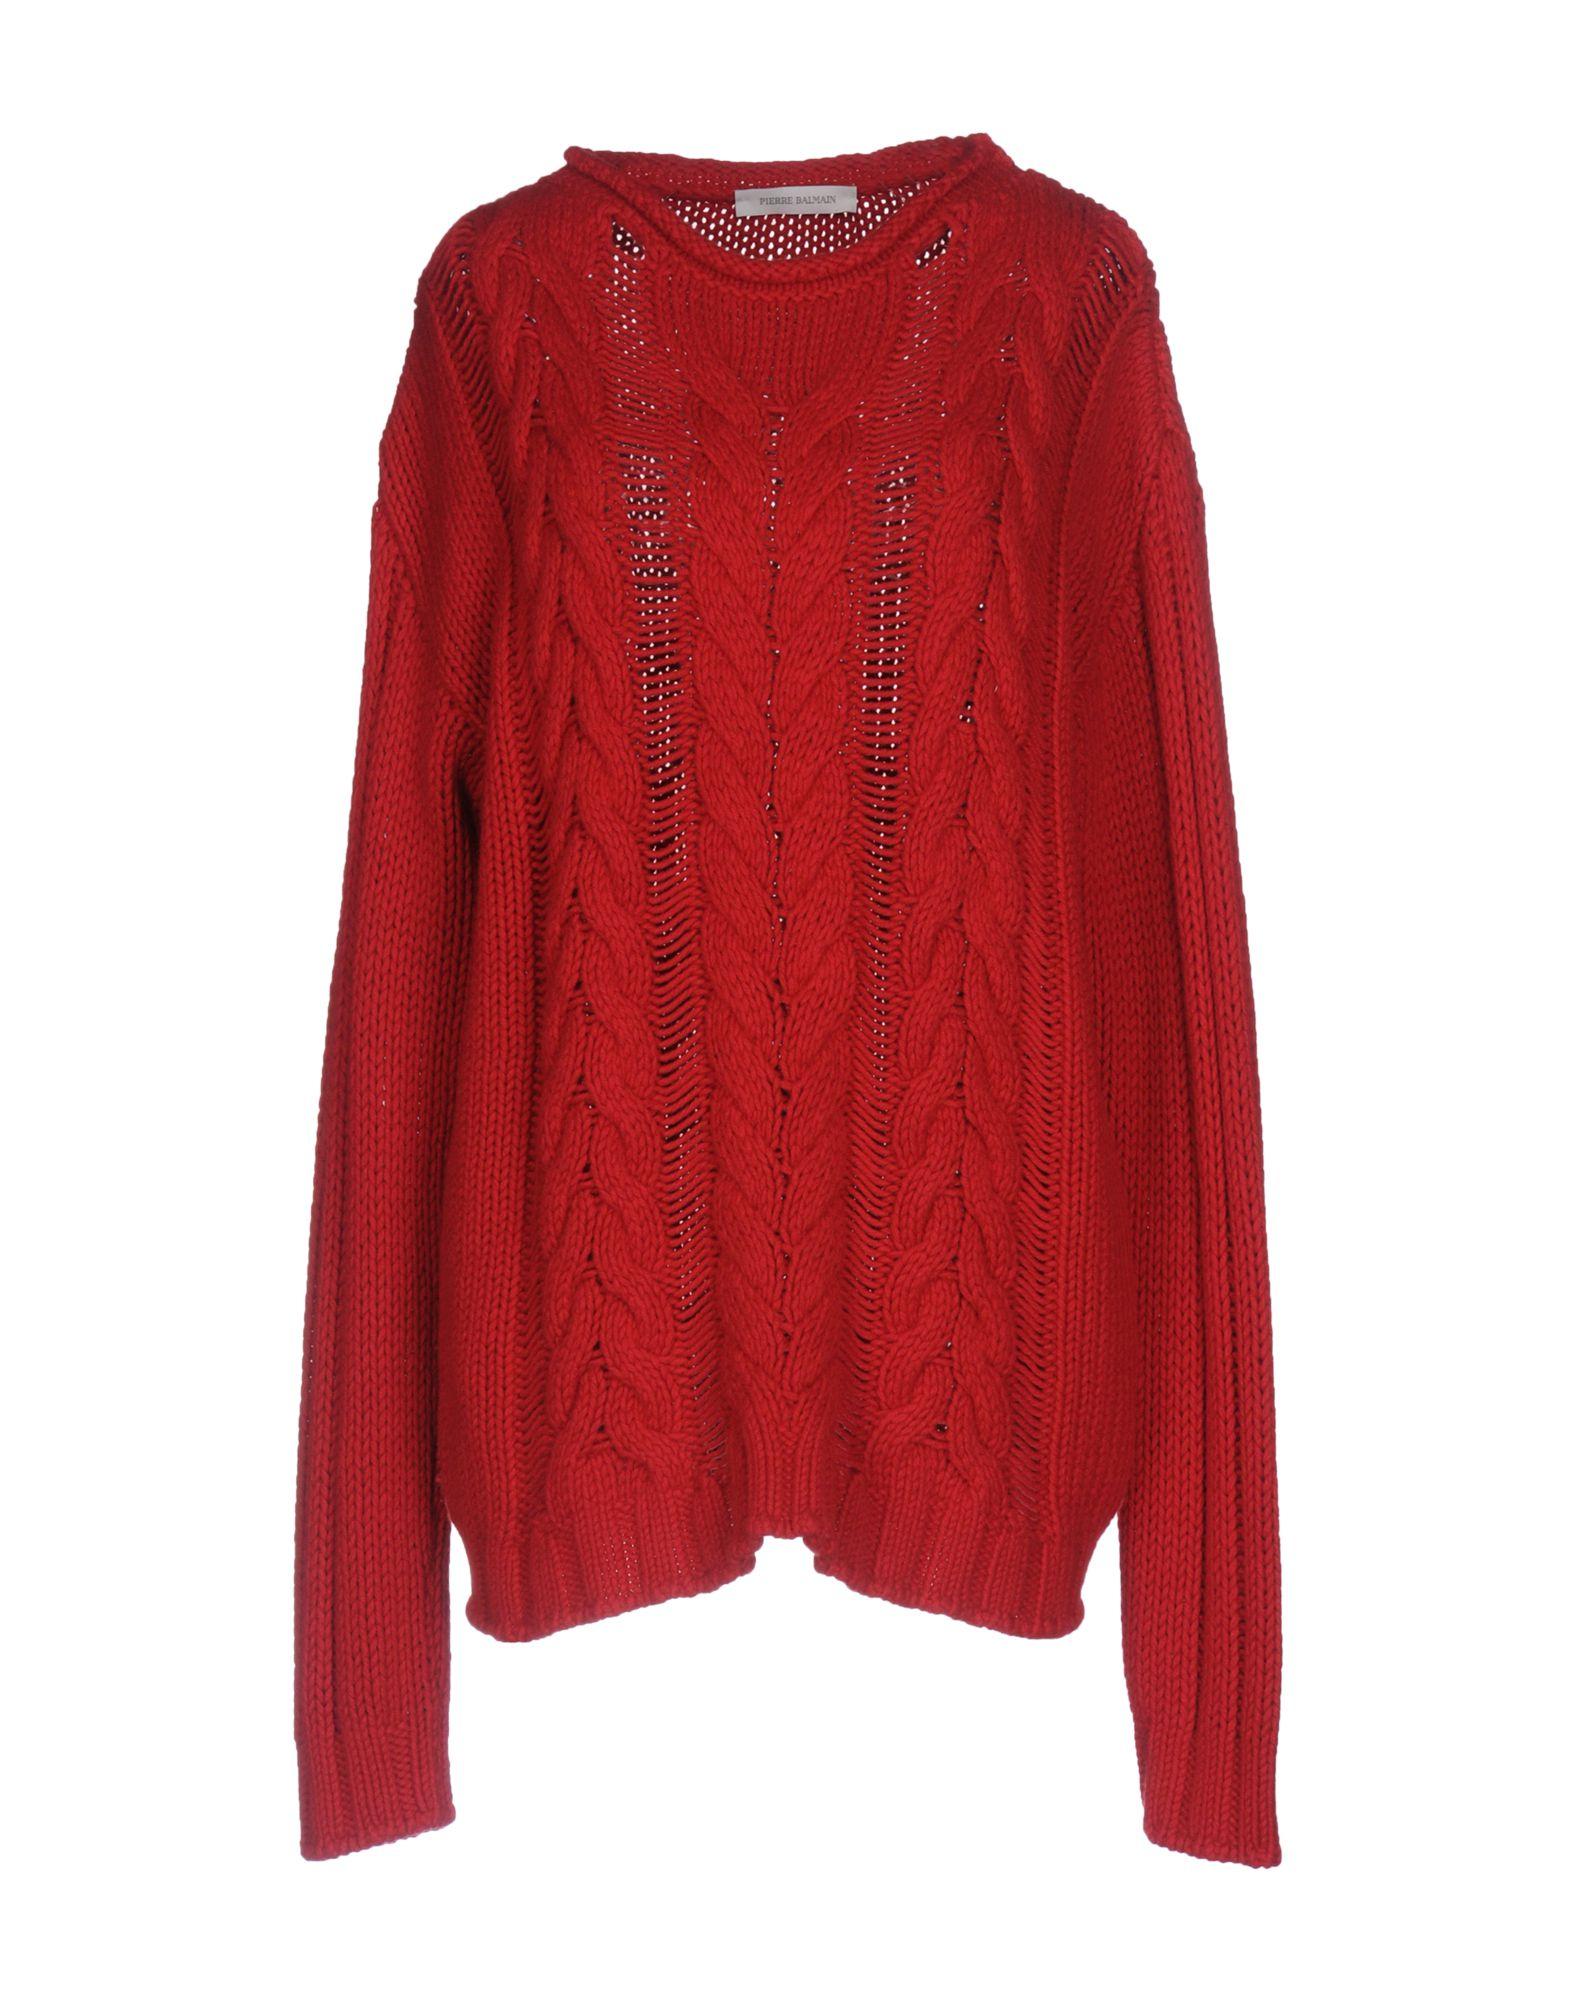 PIERRE BALMAIN Damen Pullover Farbe Rot Größe 6